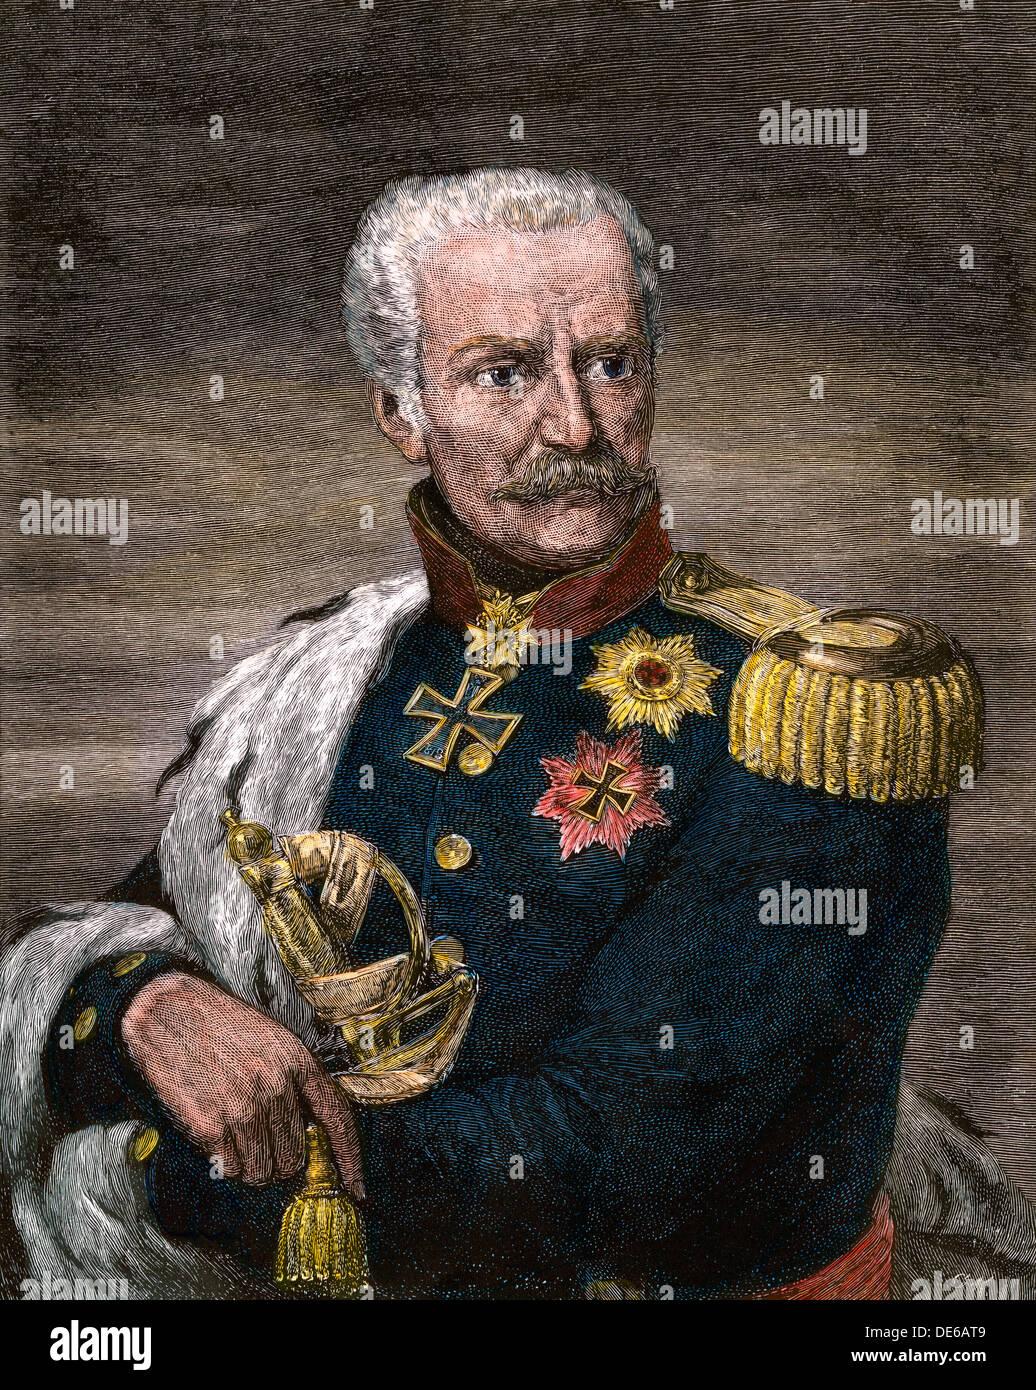 Feldmarschall Gebhard Leberecht von Blücher, preußischer Kommandant bei Waterloo. Stockbild